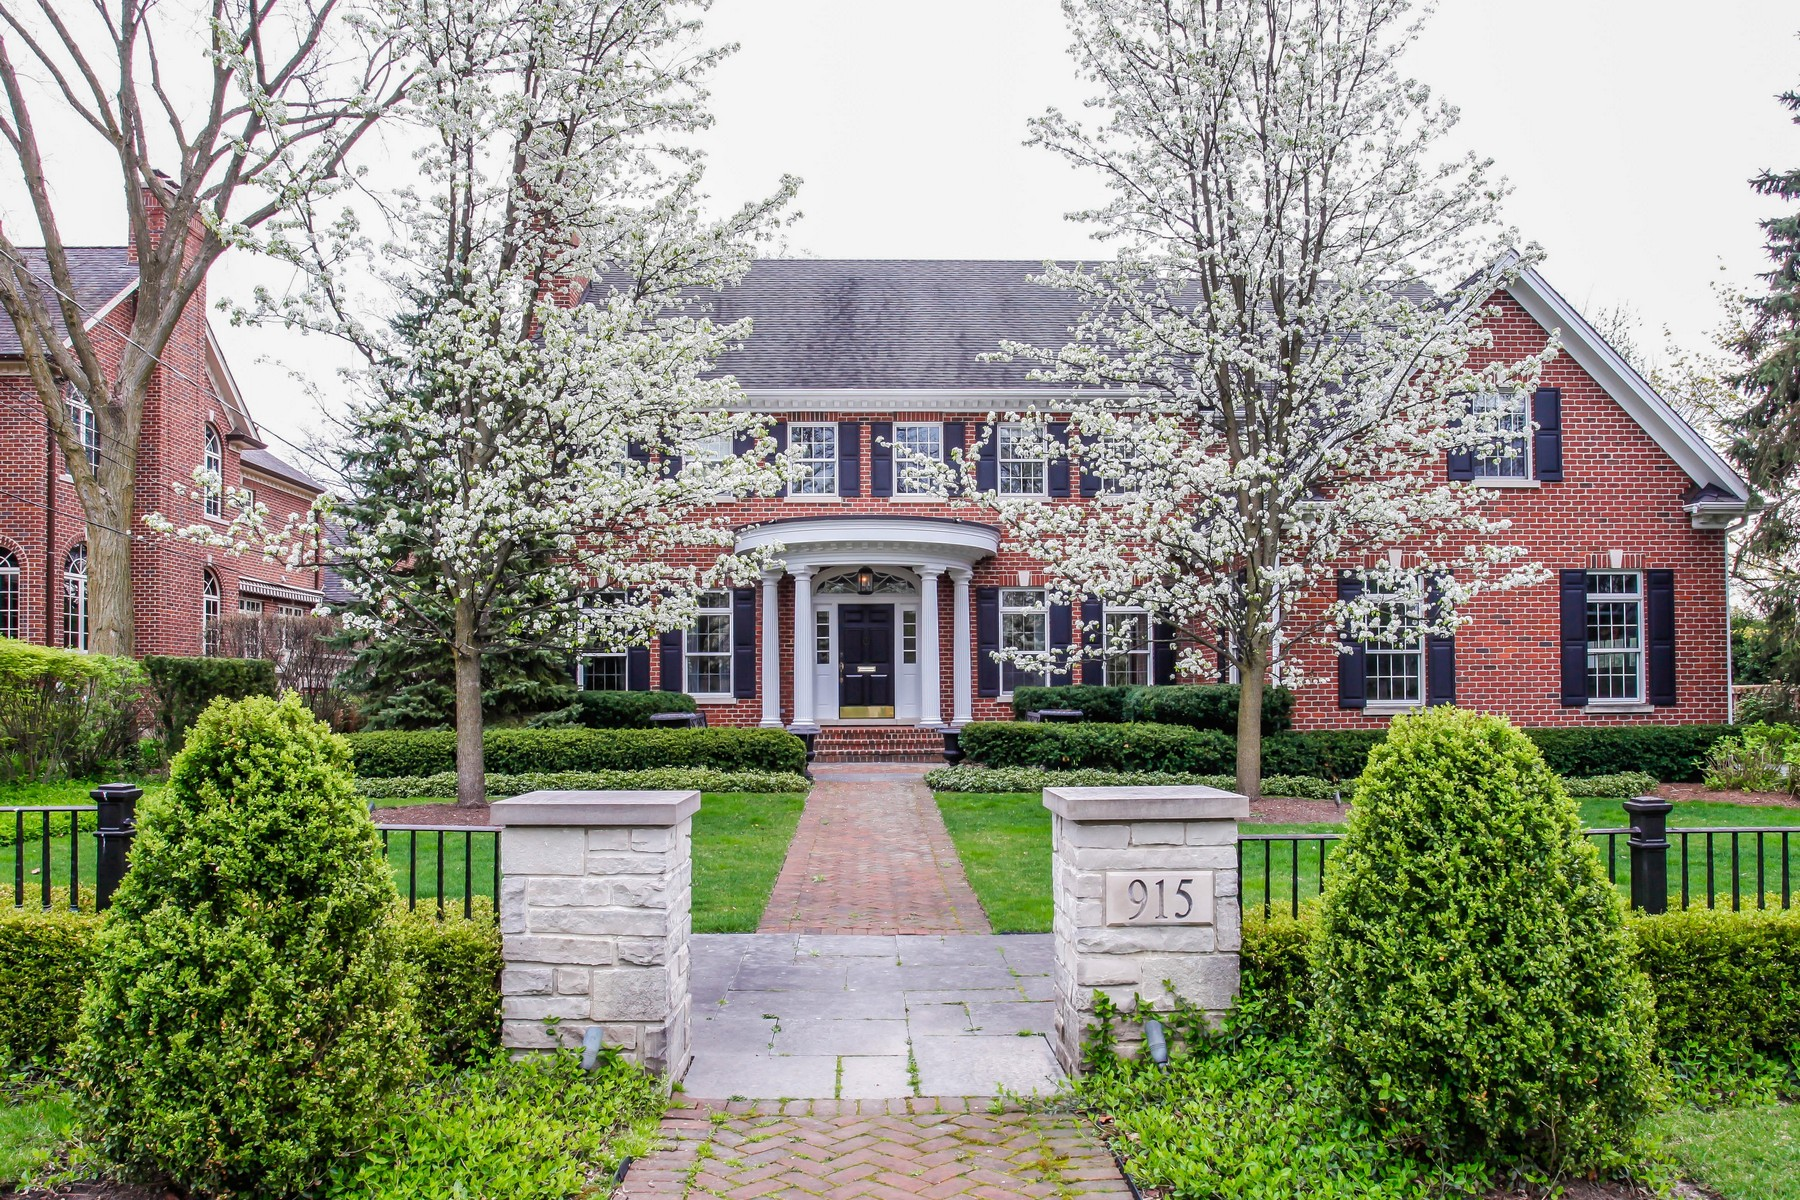 Villa per Vendita alle ore 915 S. Elm 915 S. Elm St. Hinsdale, Illinois, 60521 Stati Uniti